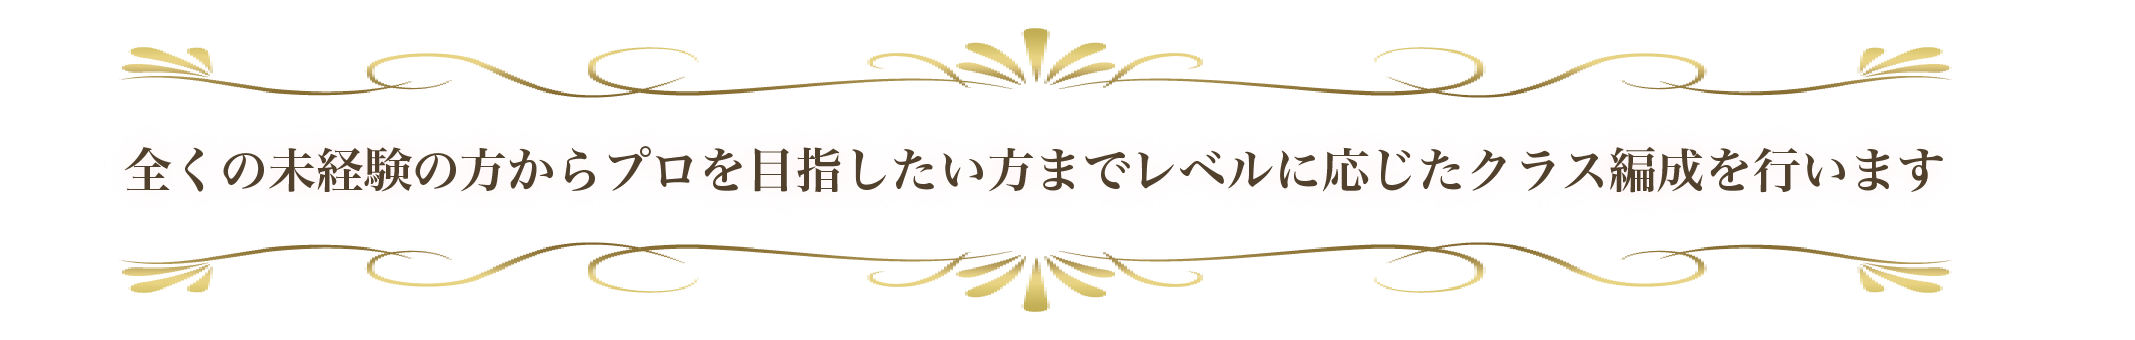 sozai2 33 - 一般クラス